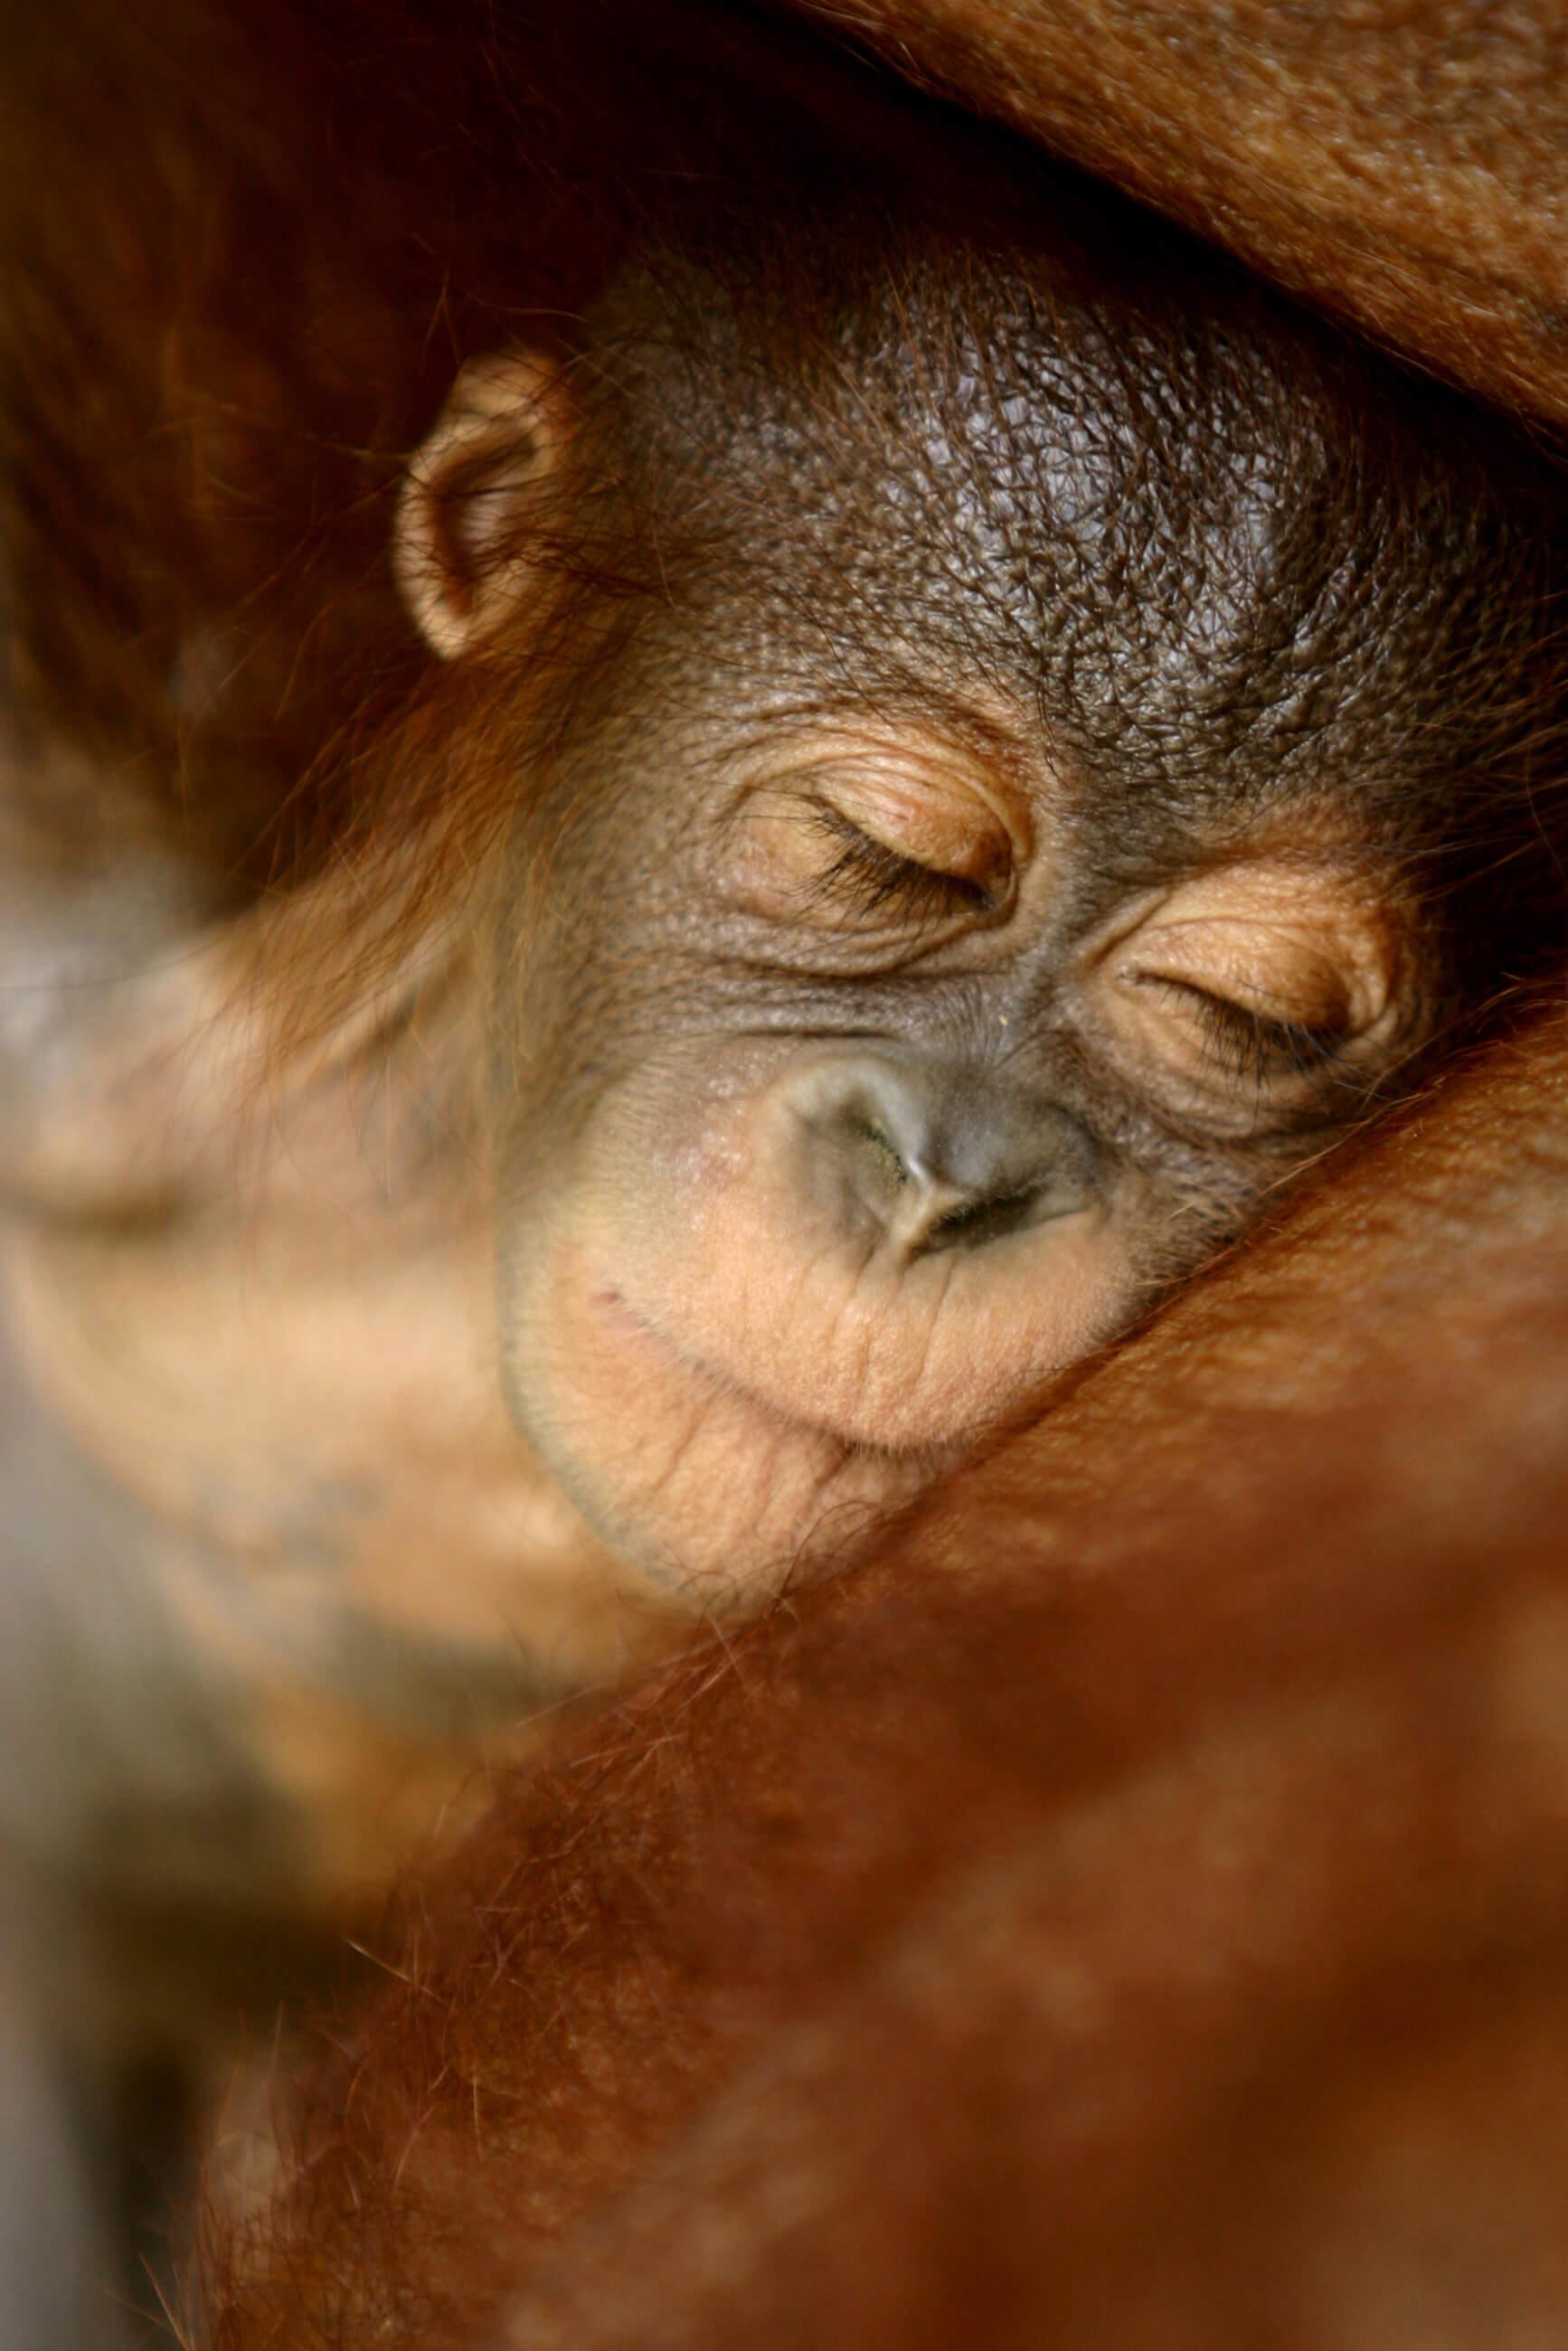 https://bubo.sk/uploads/galleries/7396/archiv_orangutan.jpg